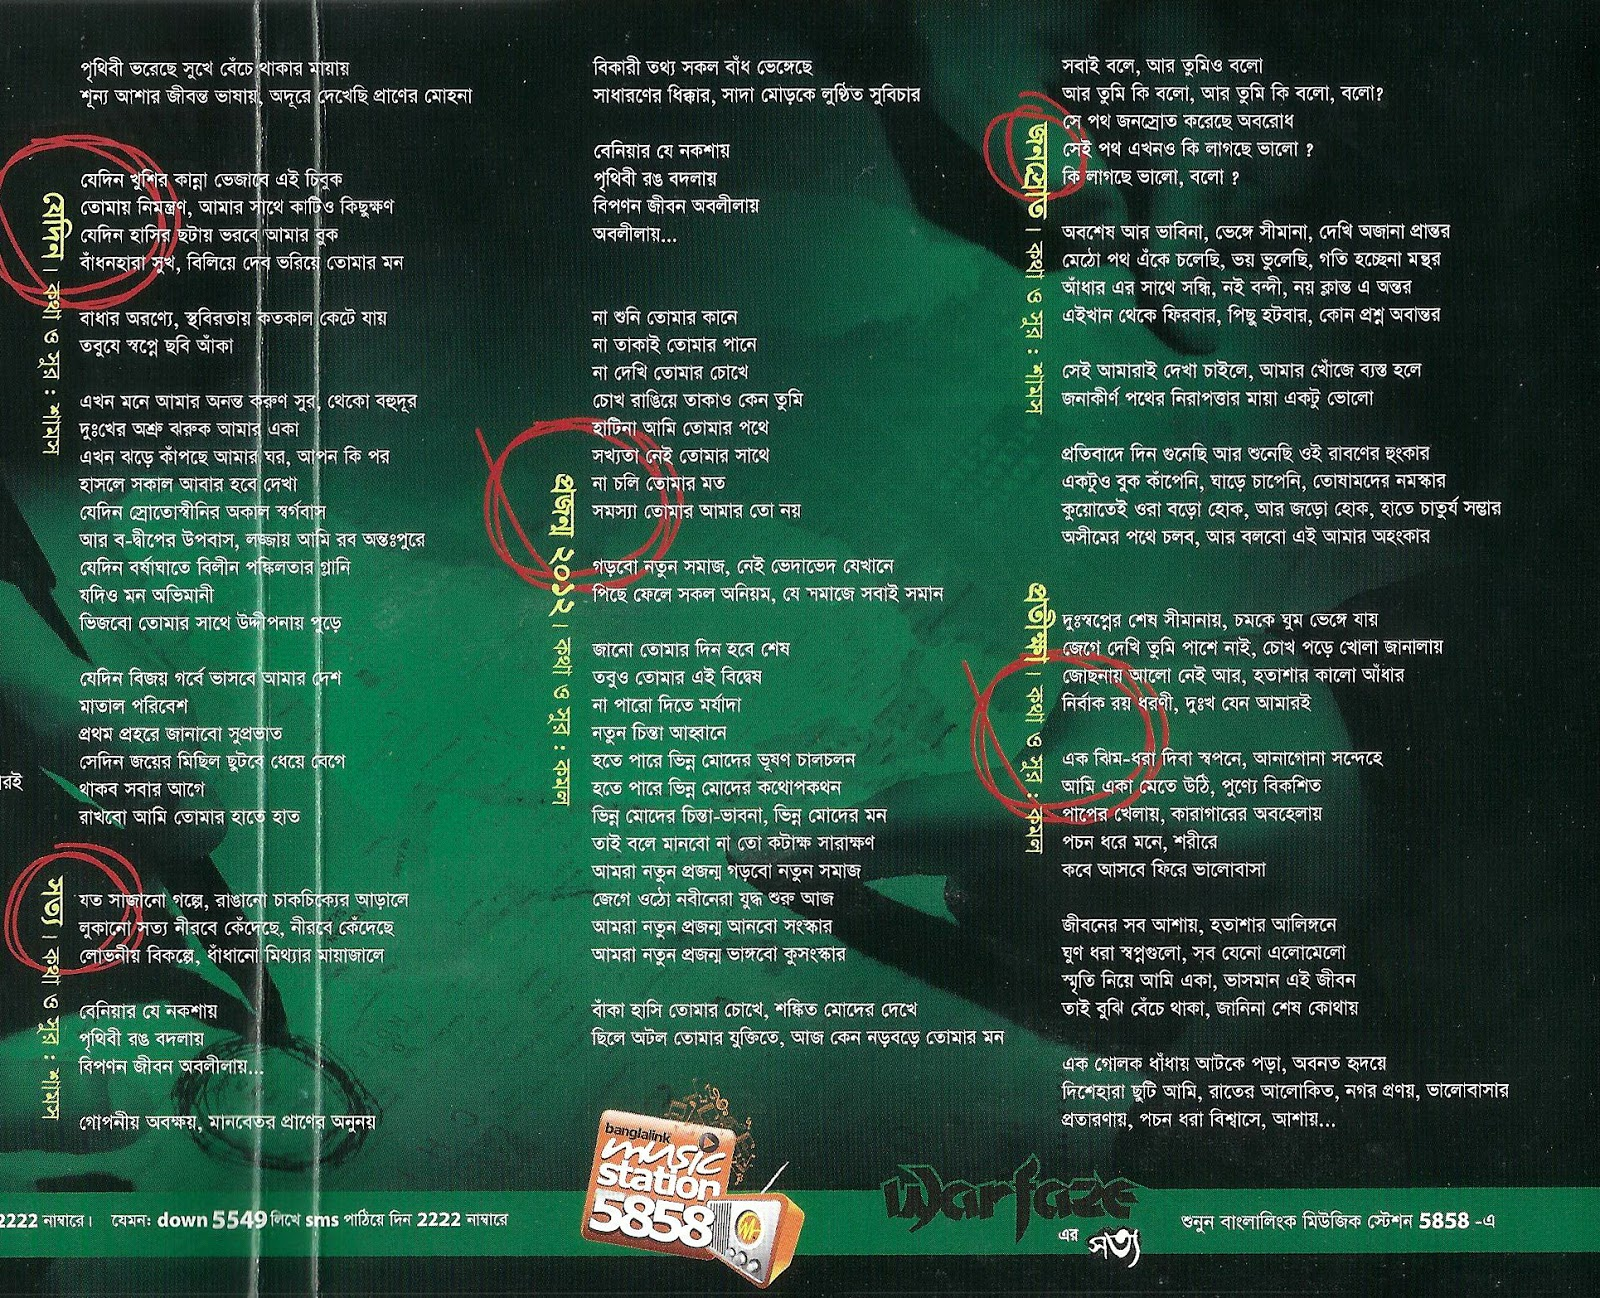 links of warfaze new album sotto 2012